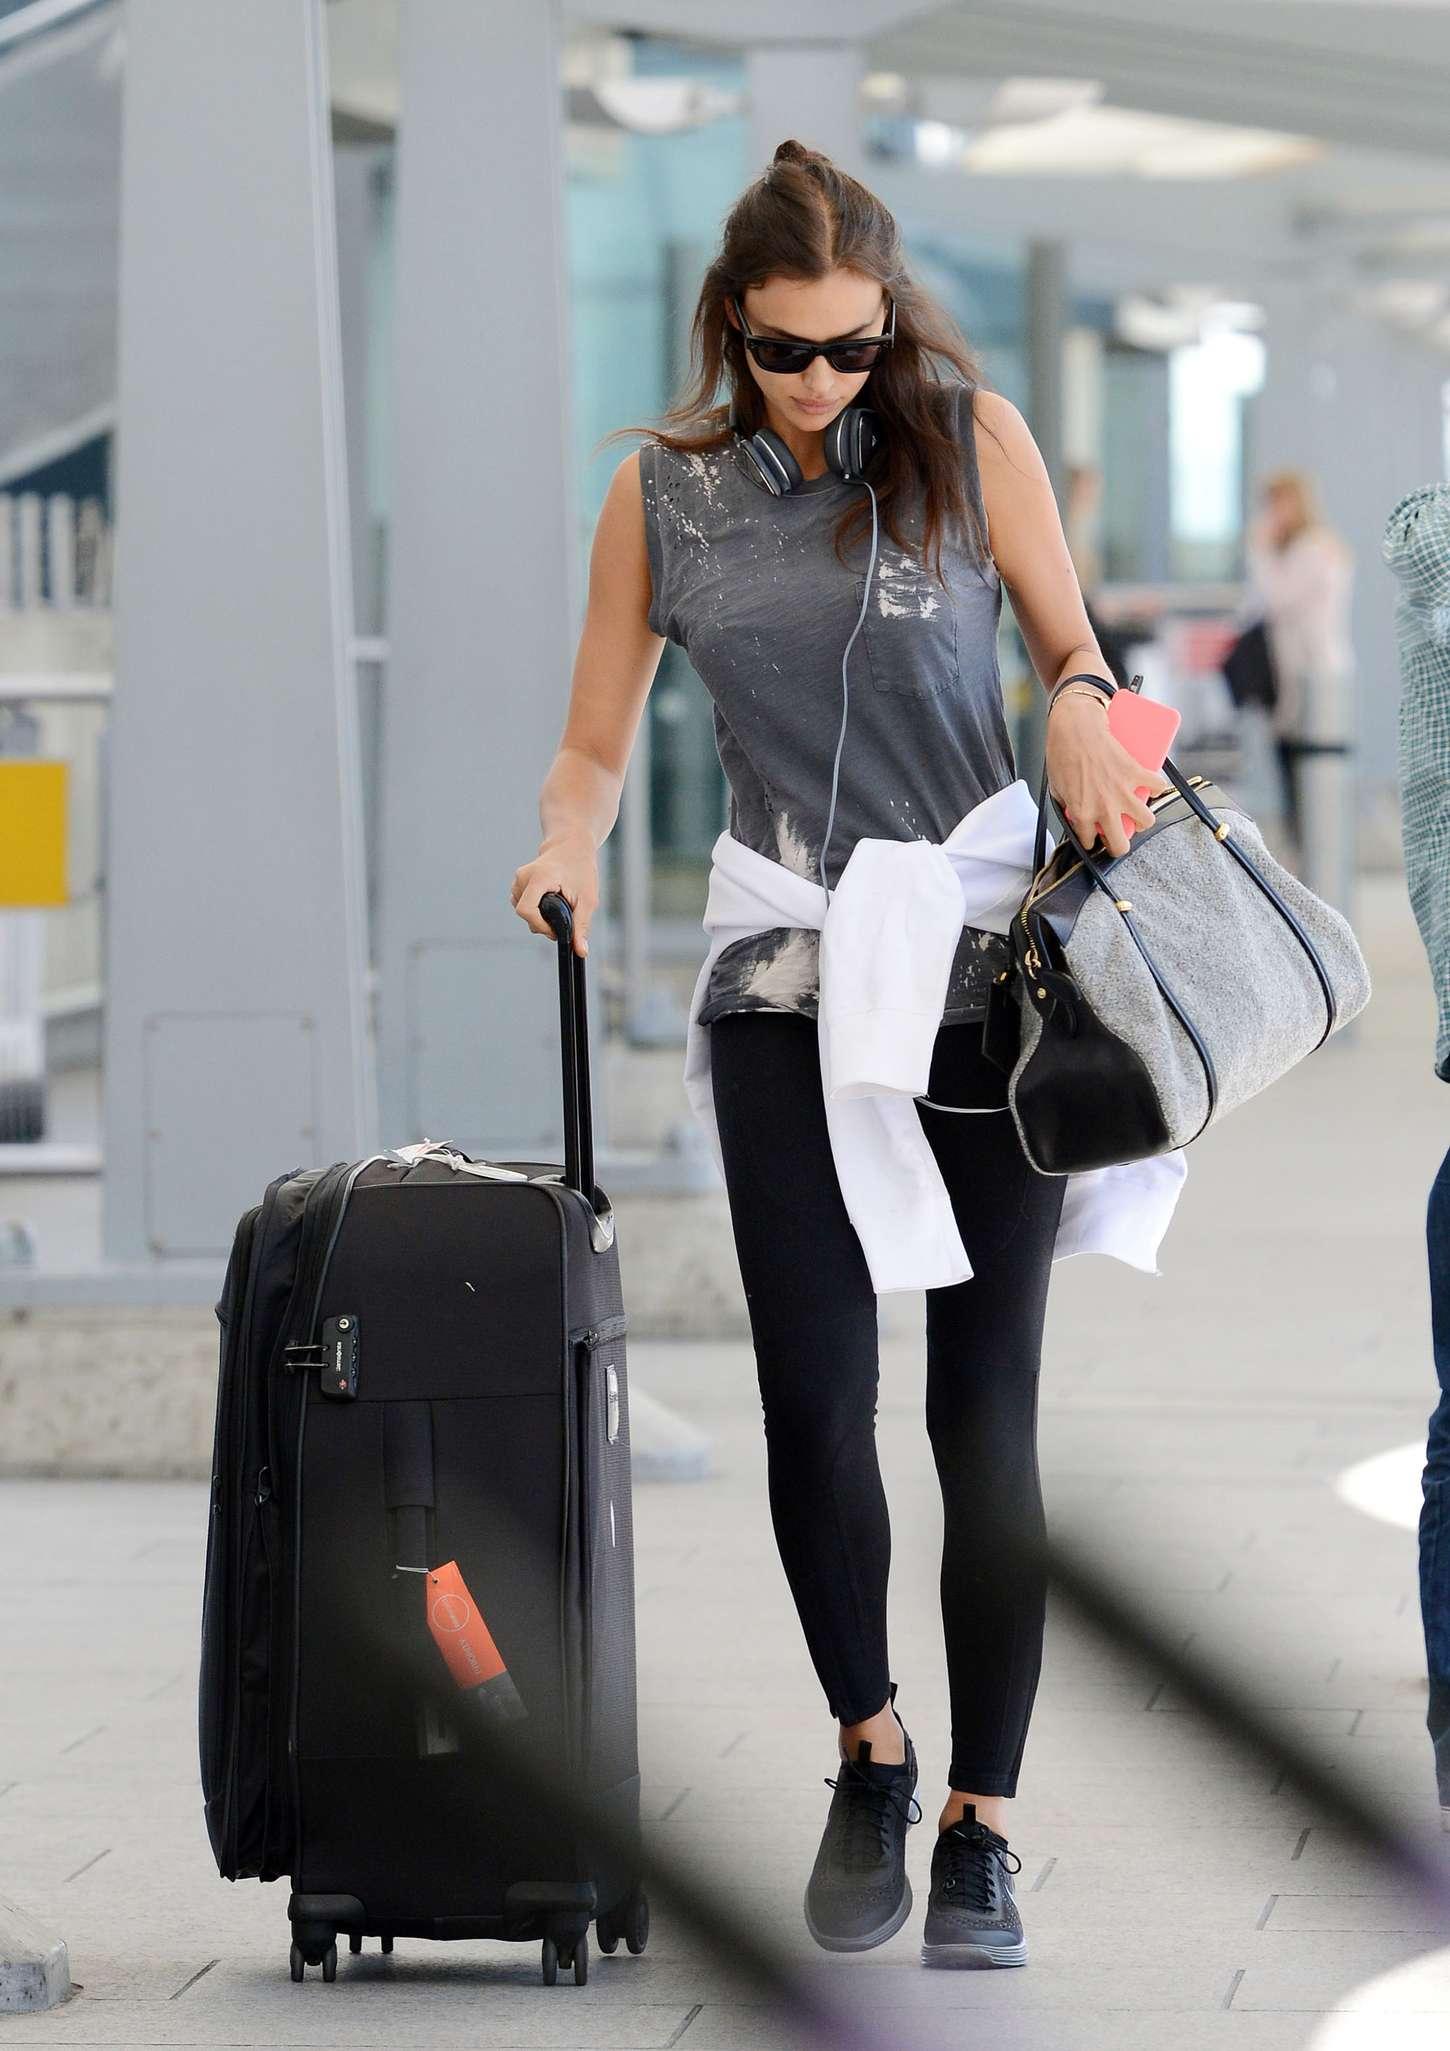 Irina Shayk 2015 : Irina Shayk in Leggings at Heathrow airport -12